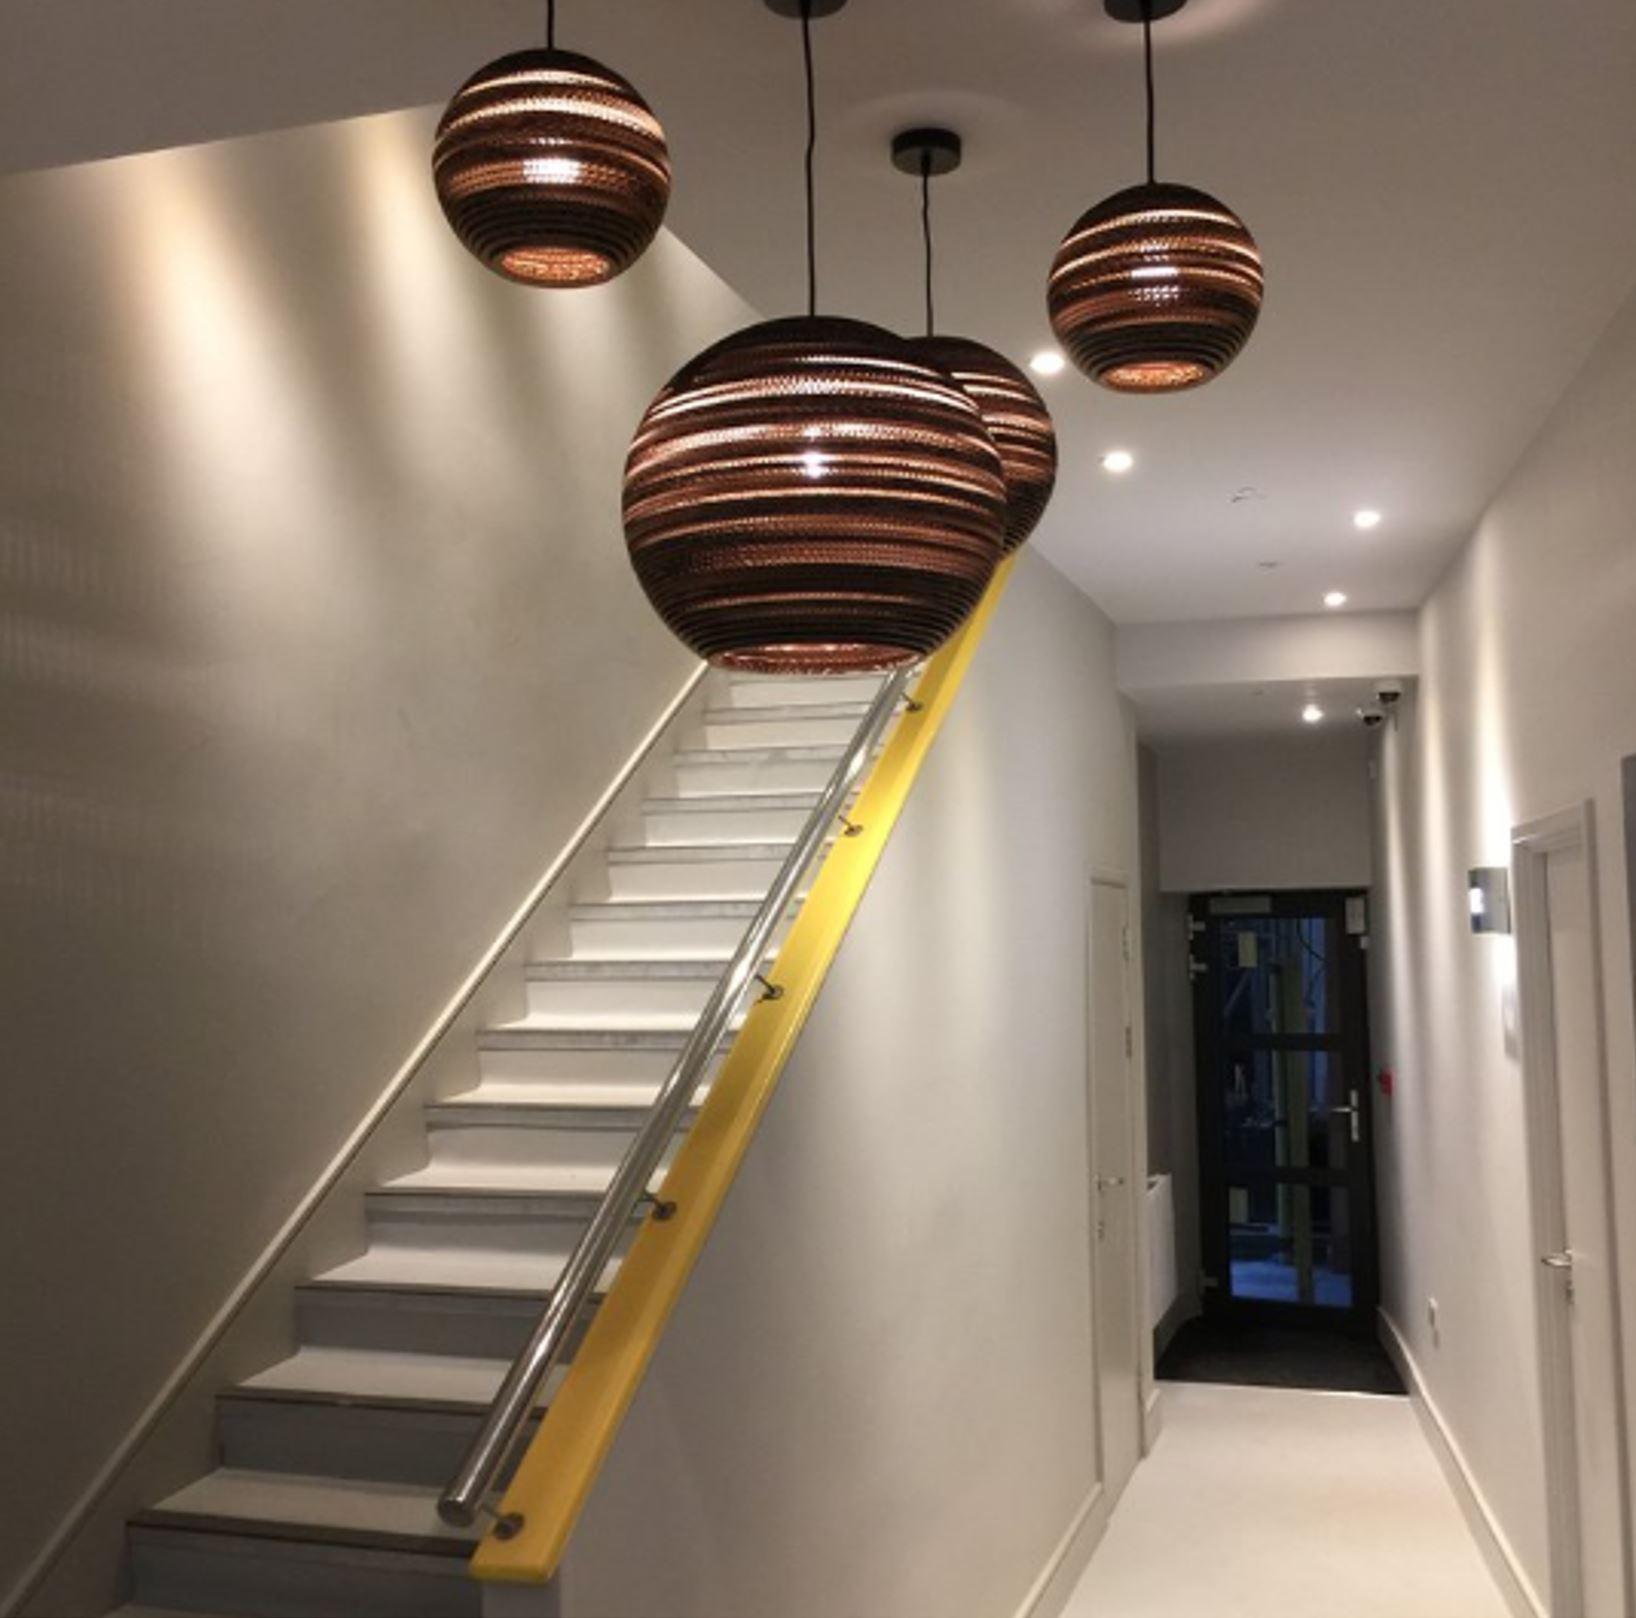 stairwell lights snip.JPG